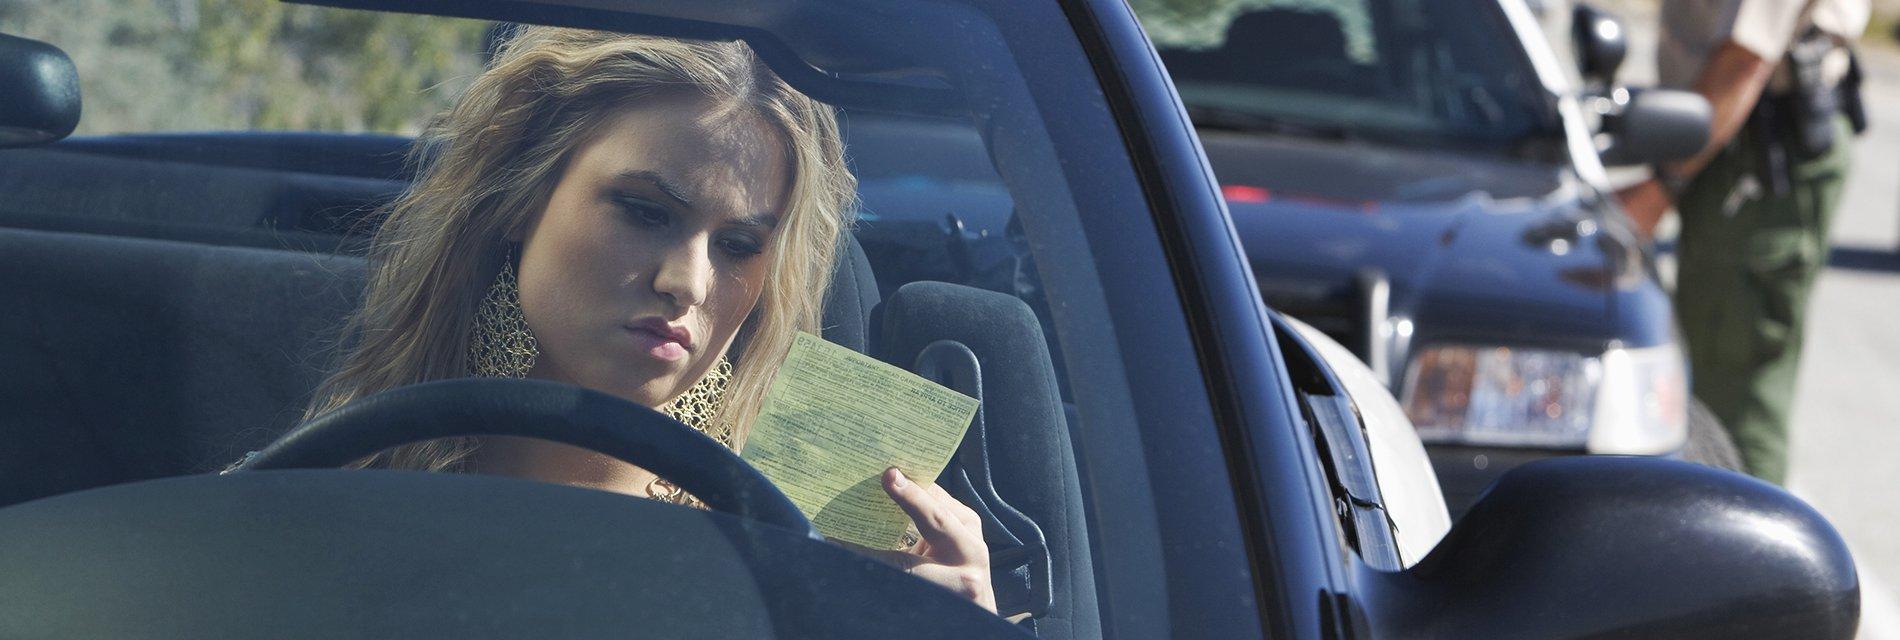 Traffic Ticket Attorney Located in Las Vegas   Vegas Ticket Fix